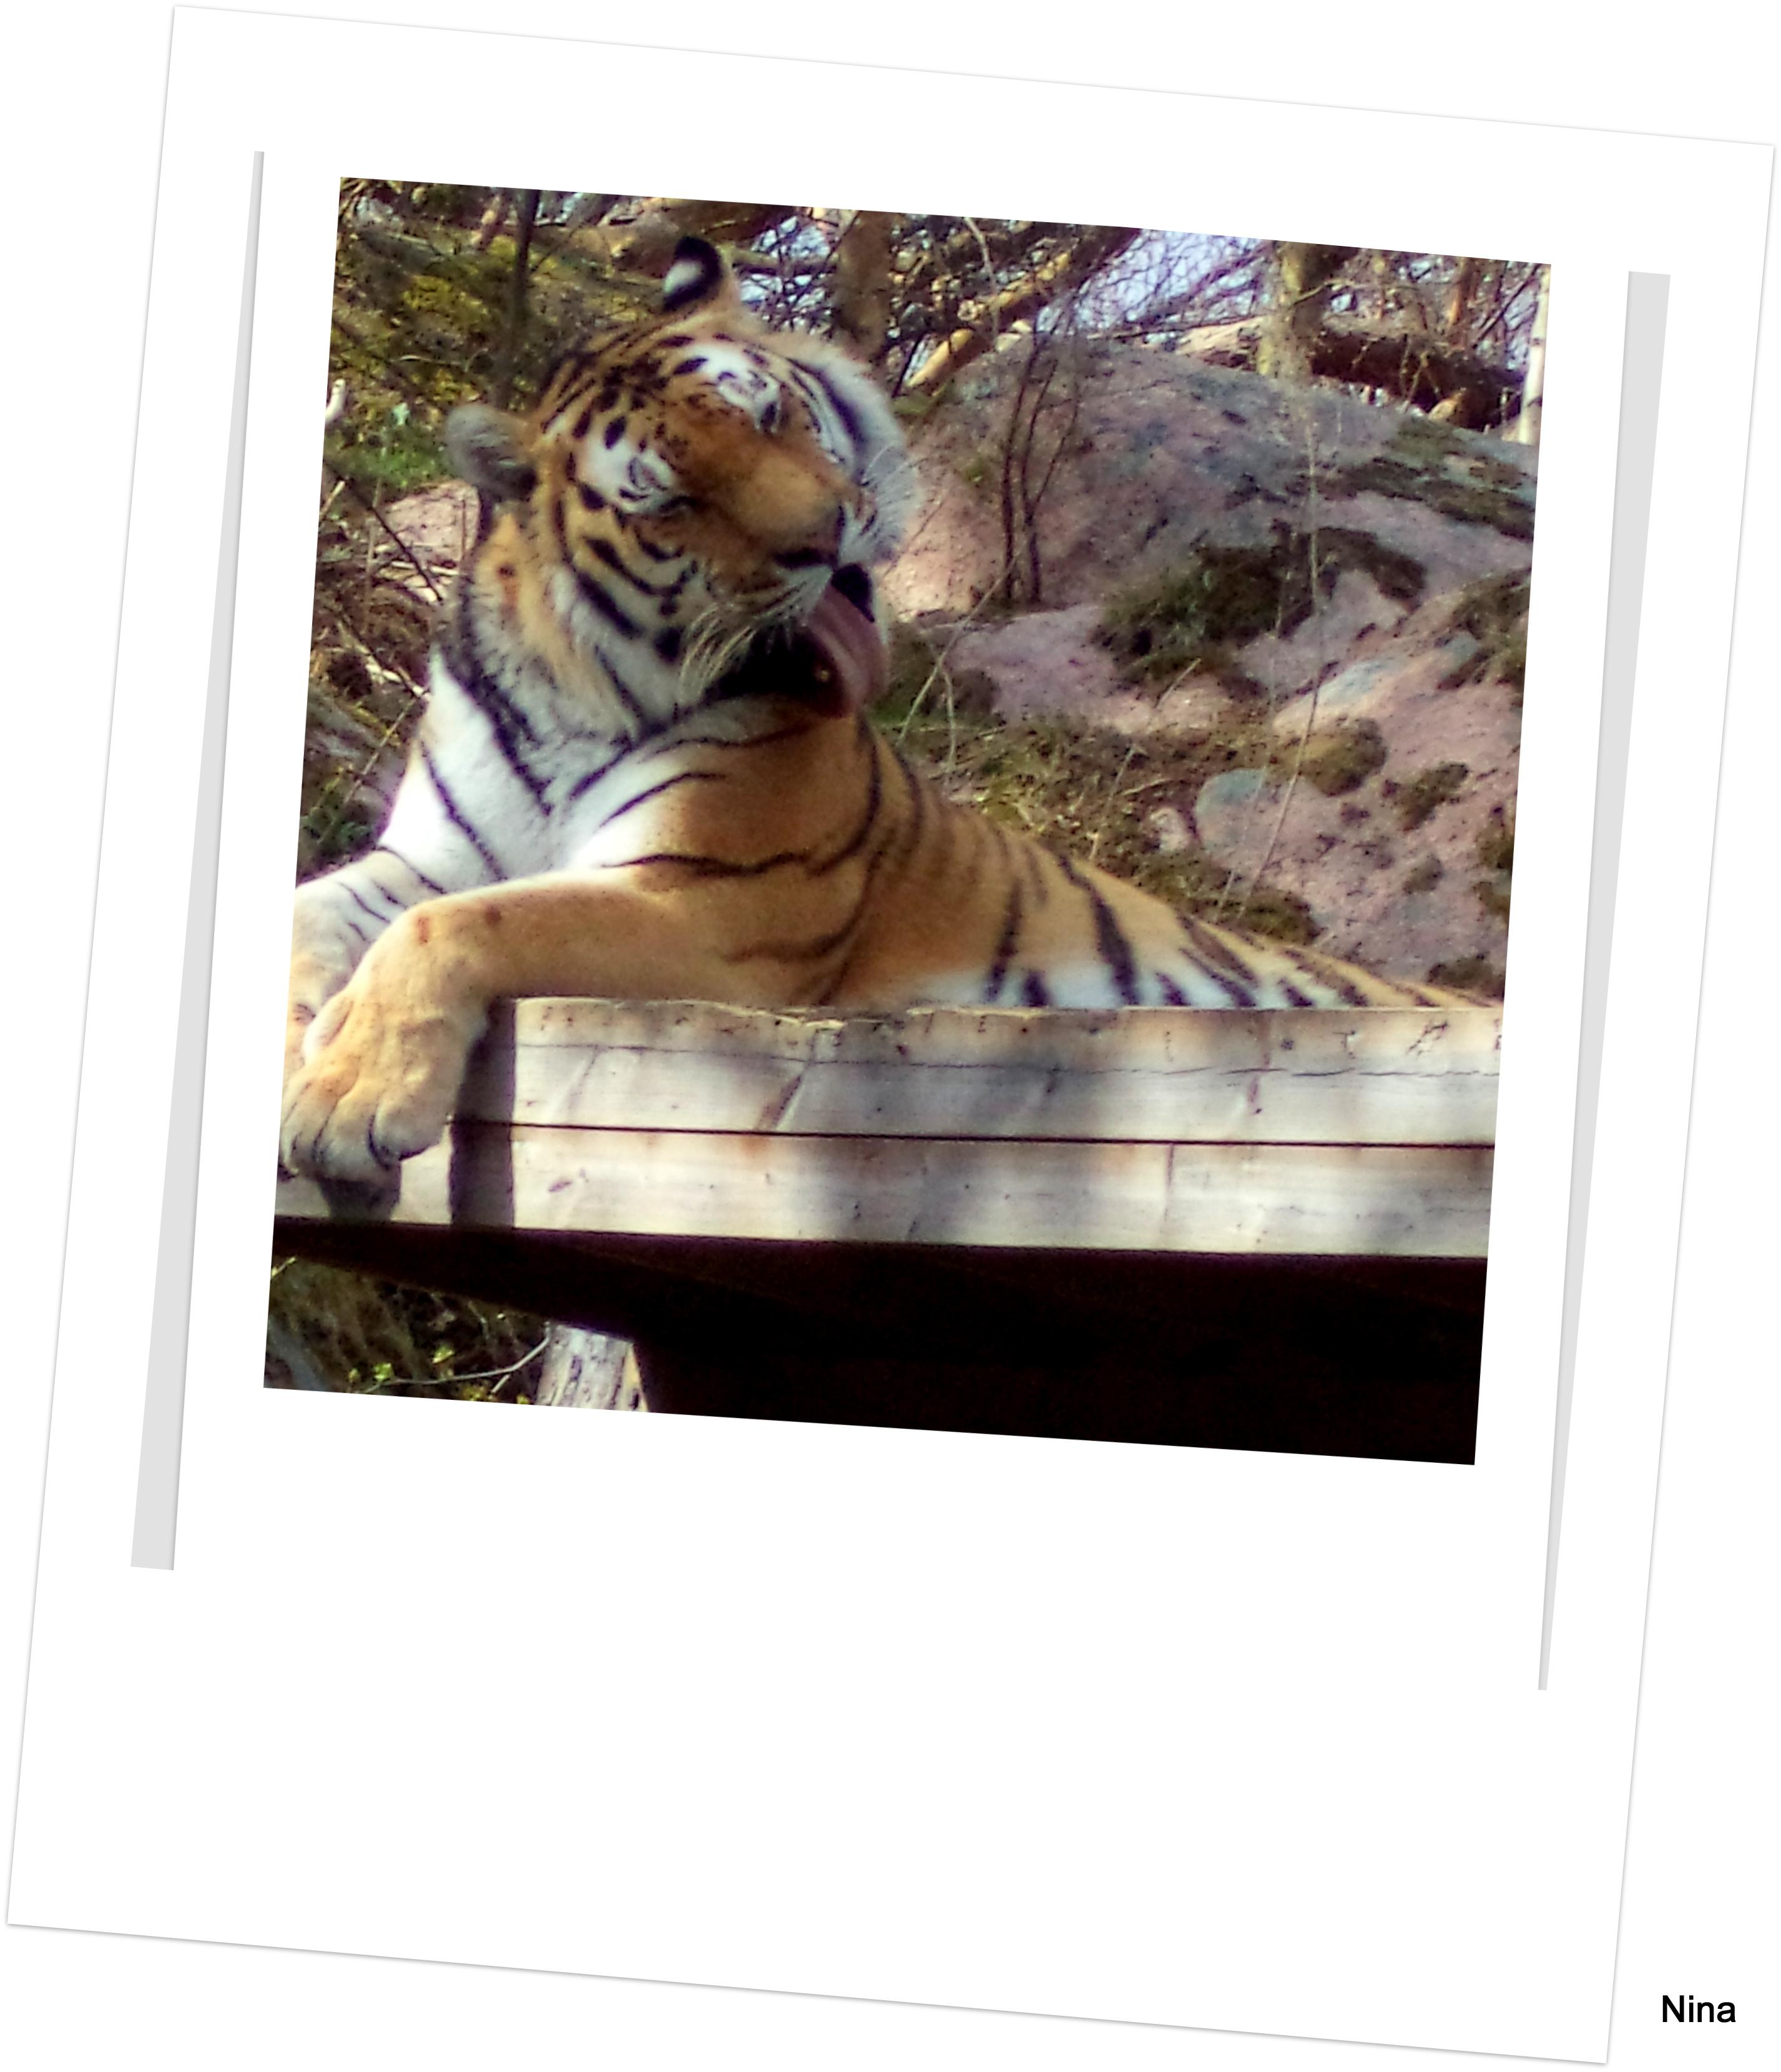 Tigerbild 5